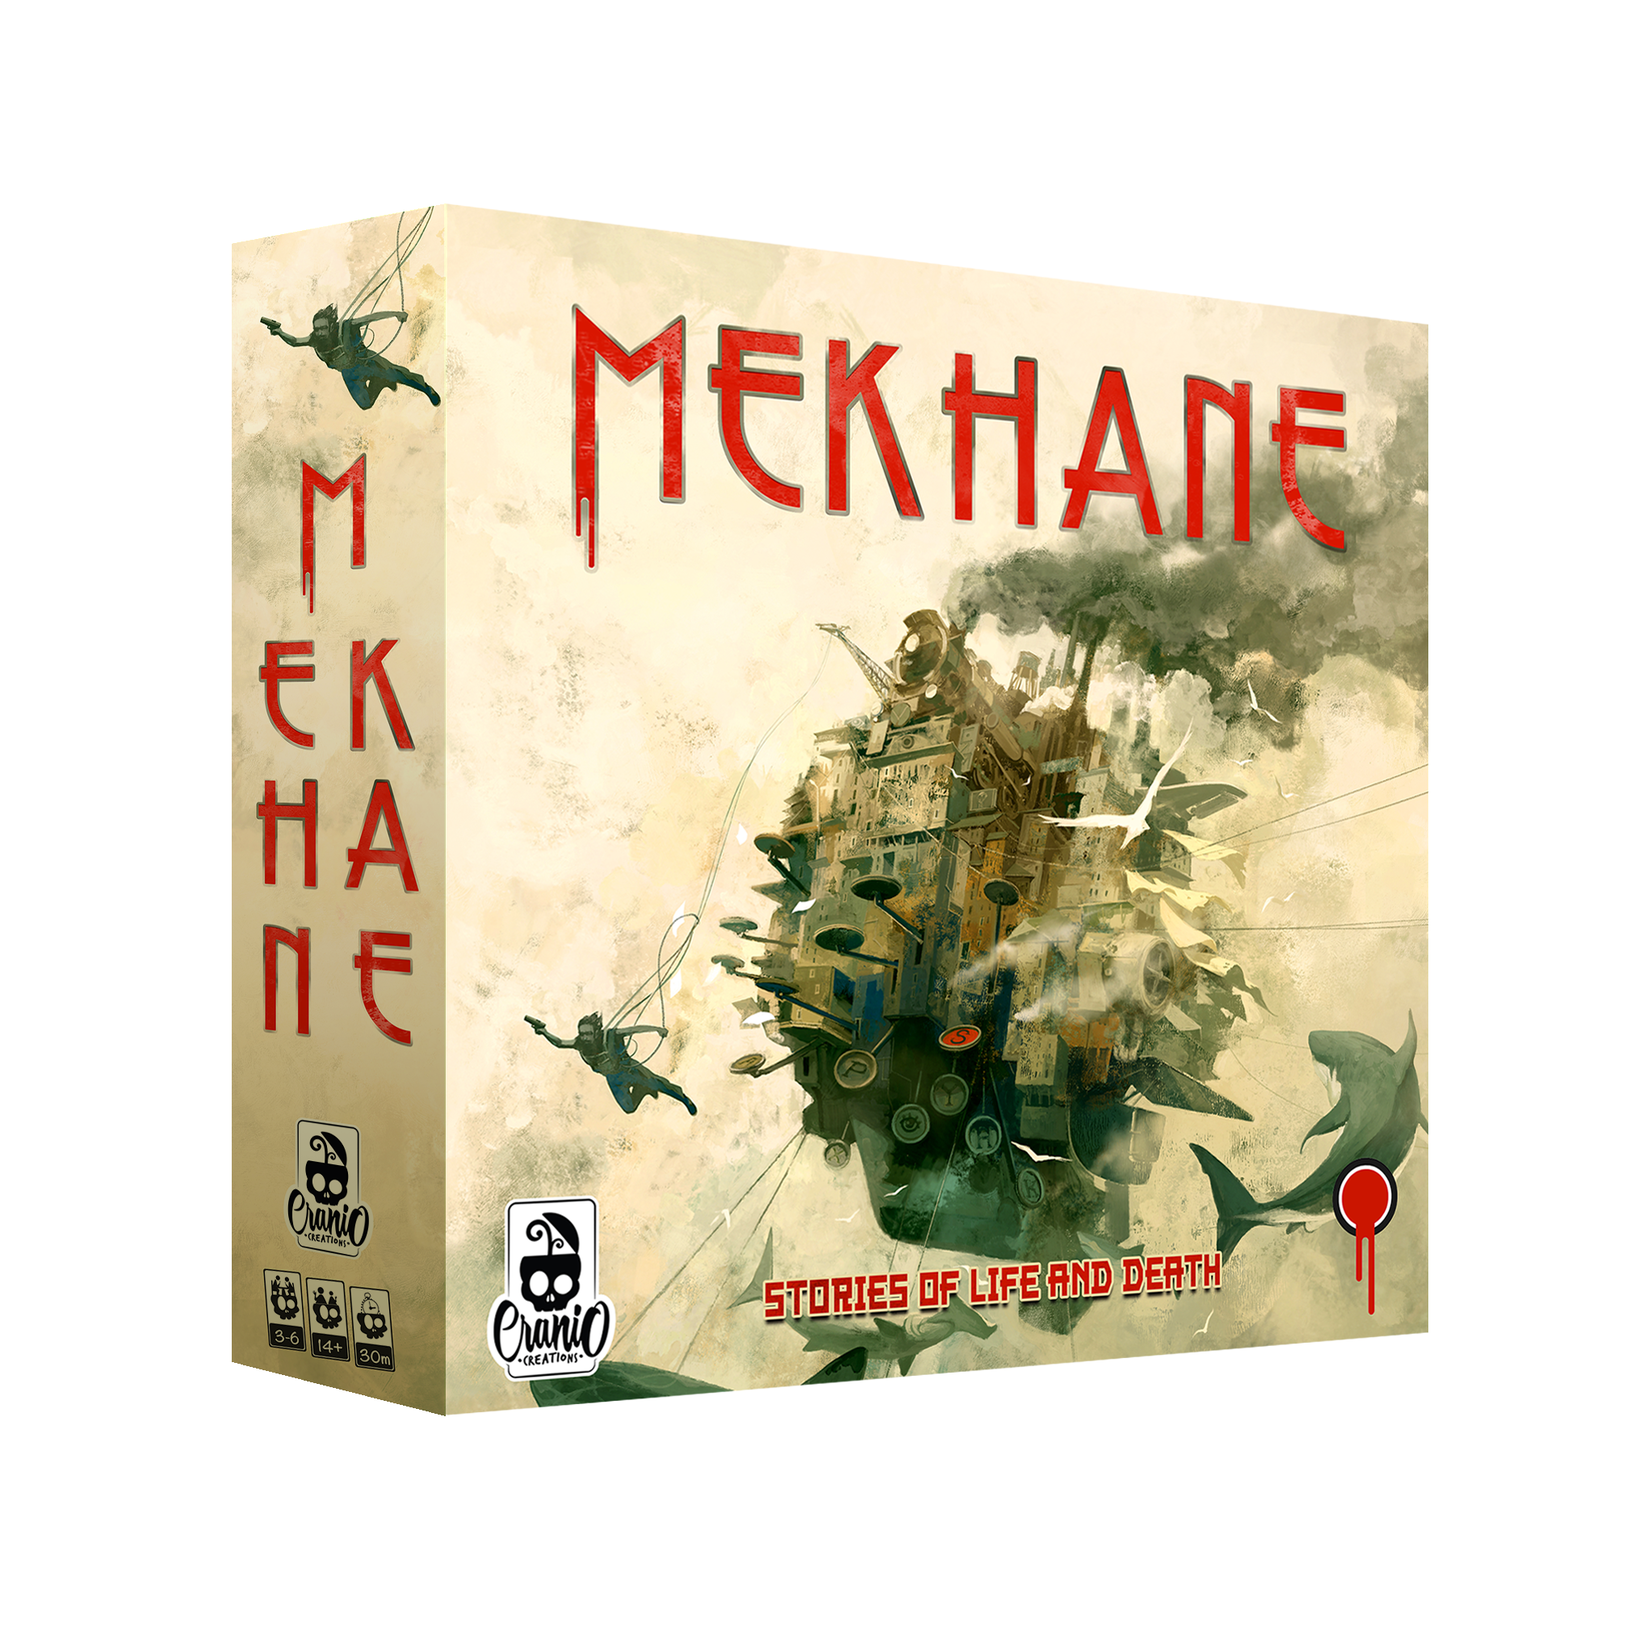 Cranio Creations Mekhane